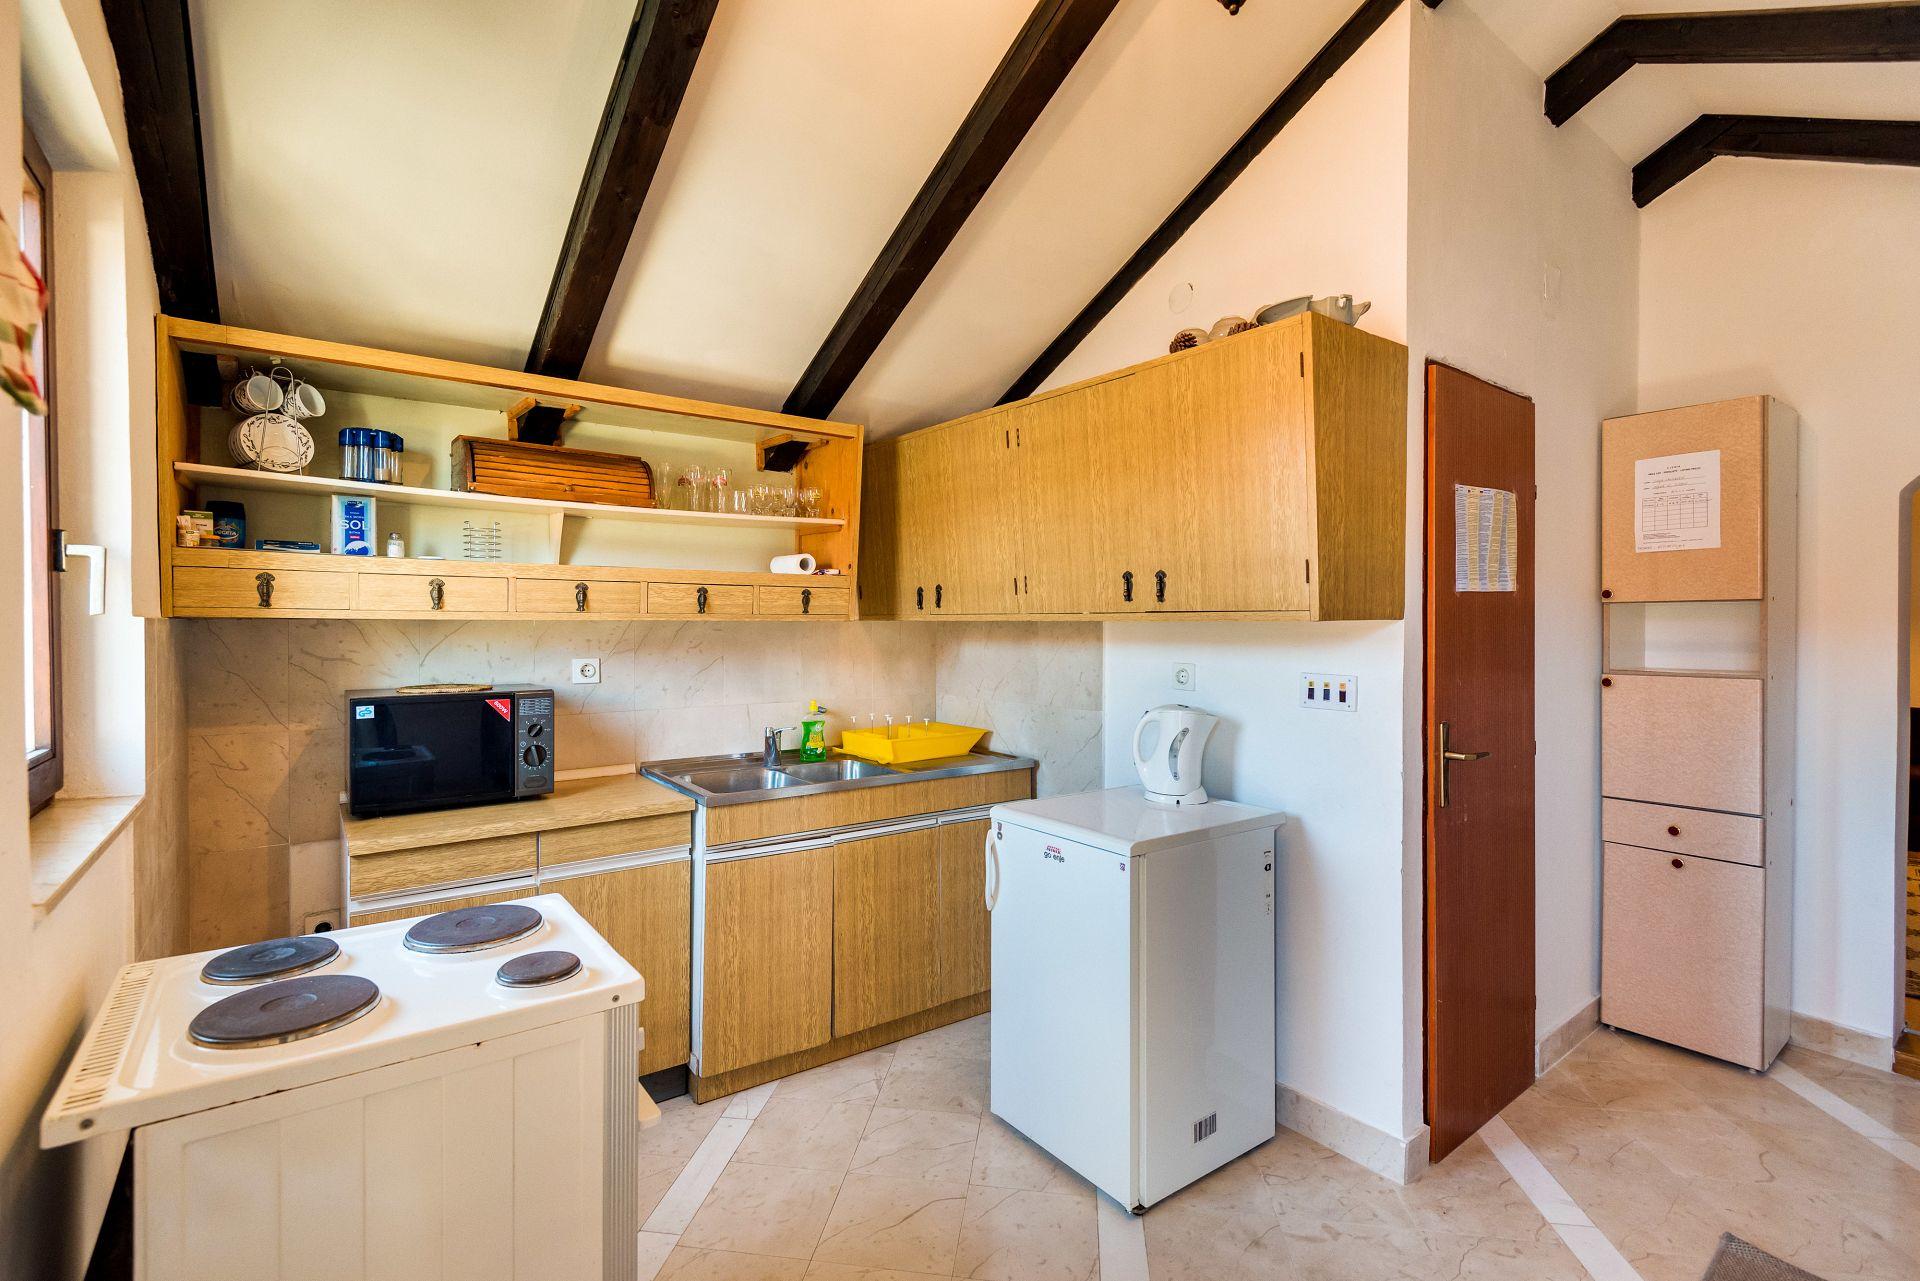 Apartamenty Apartment Land - 100m from the sea A1 Zlarin (Island Zlarin), Riviera Sibenik 51982, Zlarin, Zlarin, Region Šibenik